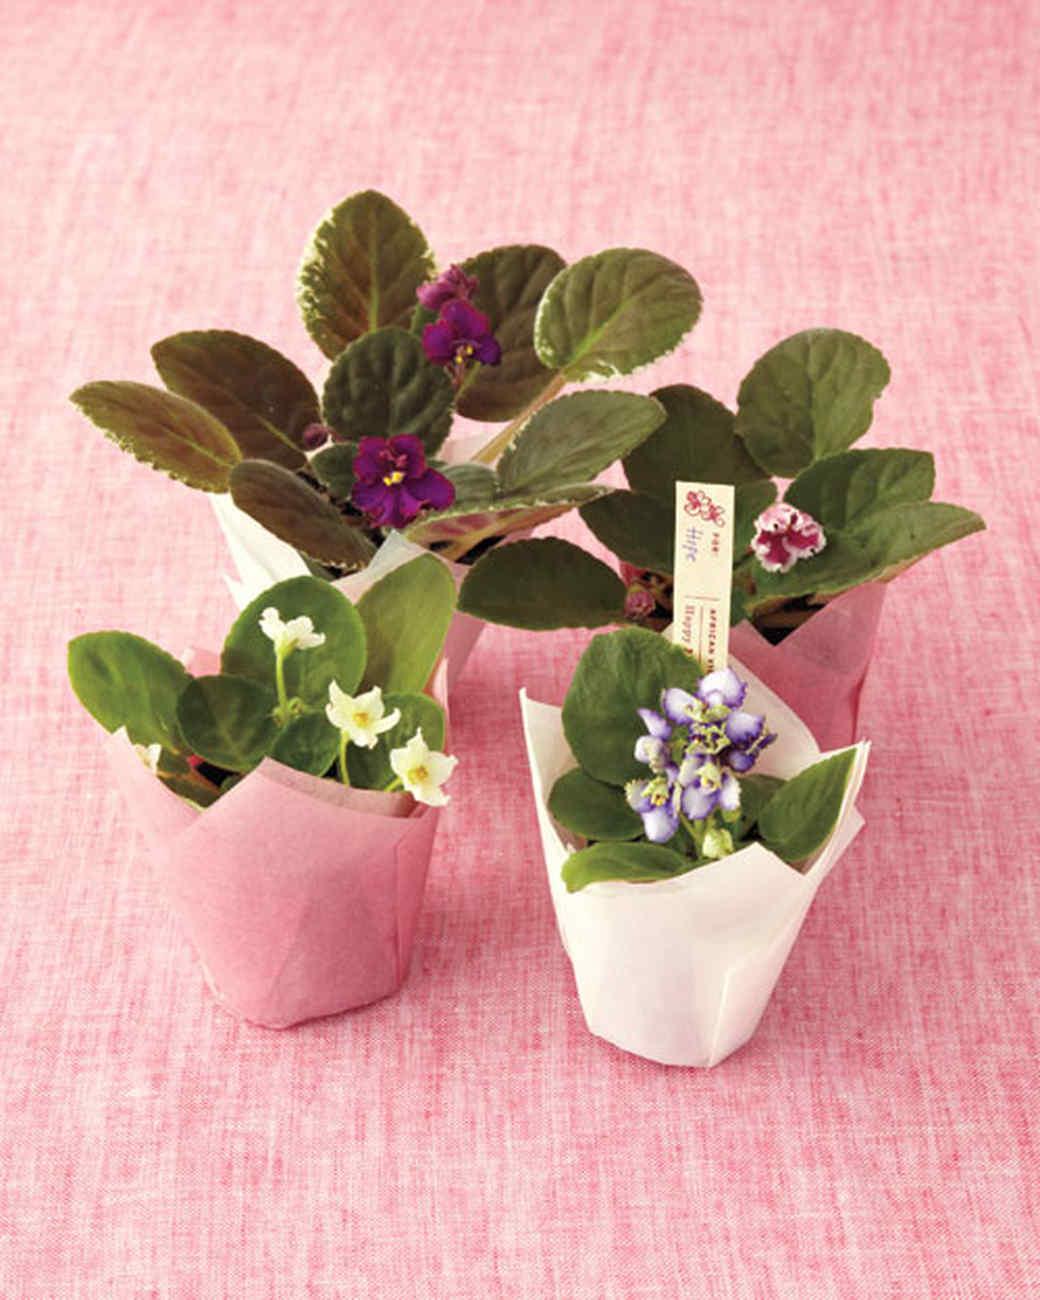 violet-gems-0511mld107066.jpg